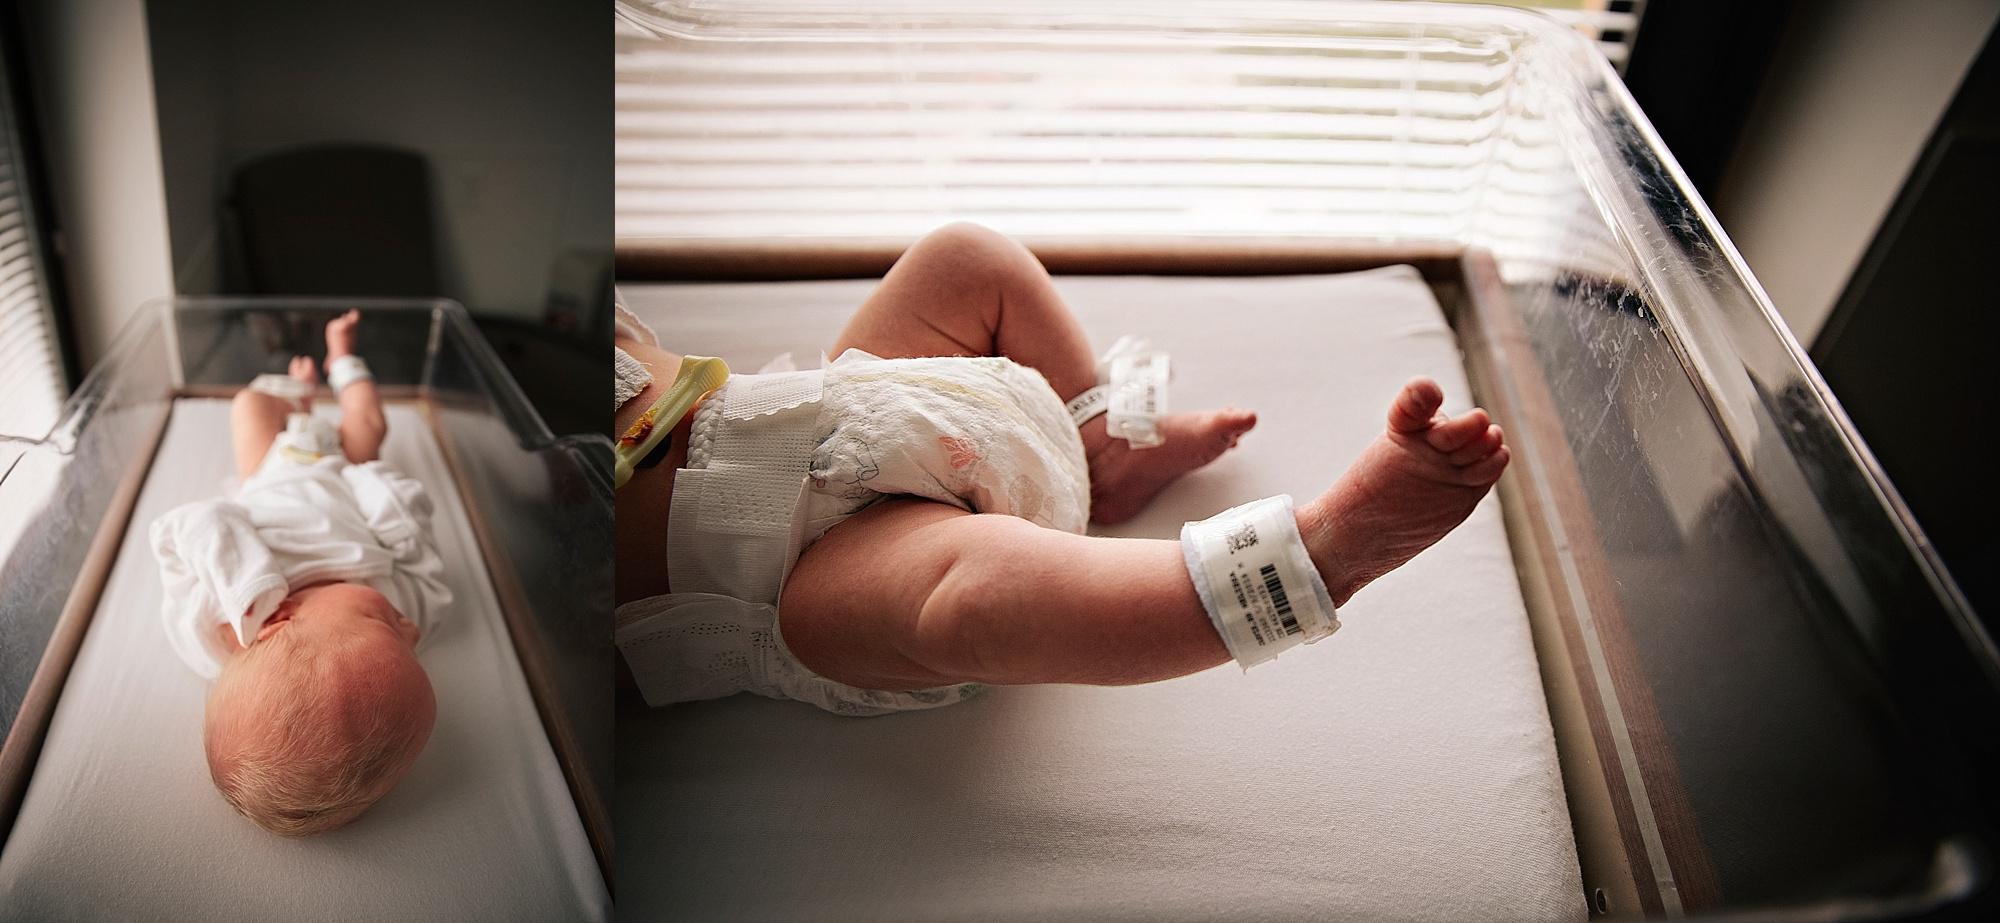 lauren-grayson-photography-akron-ohio-photographer-family-newborn-fresh-48-baby-hospital-photo-shoot-cleveland-clinic-akron-general-carter_0339.jpg